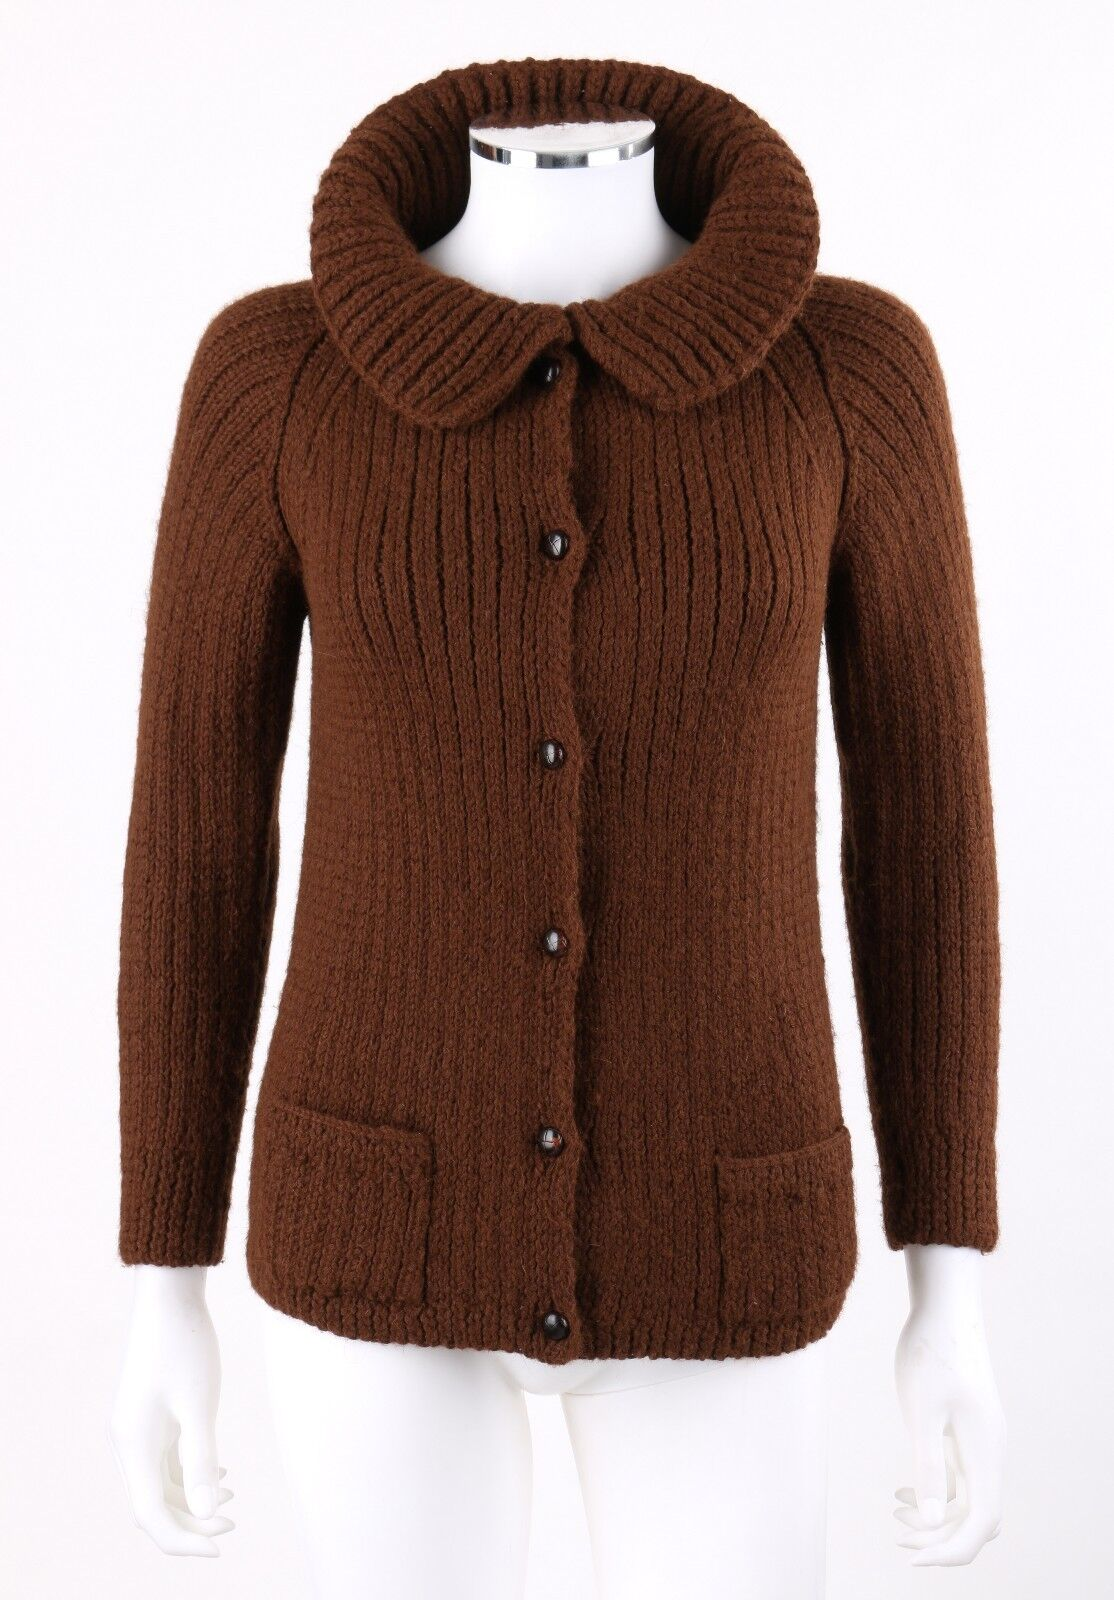 LYELL Brown Chunky Handknit Alpaca Rib Knit Button Up Cardigan Sweater XS Rare